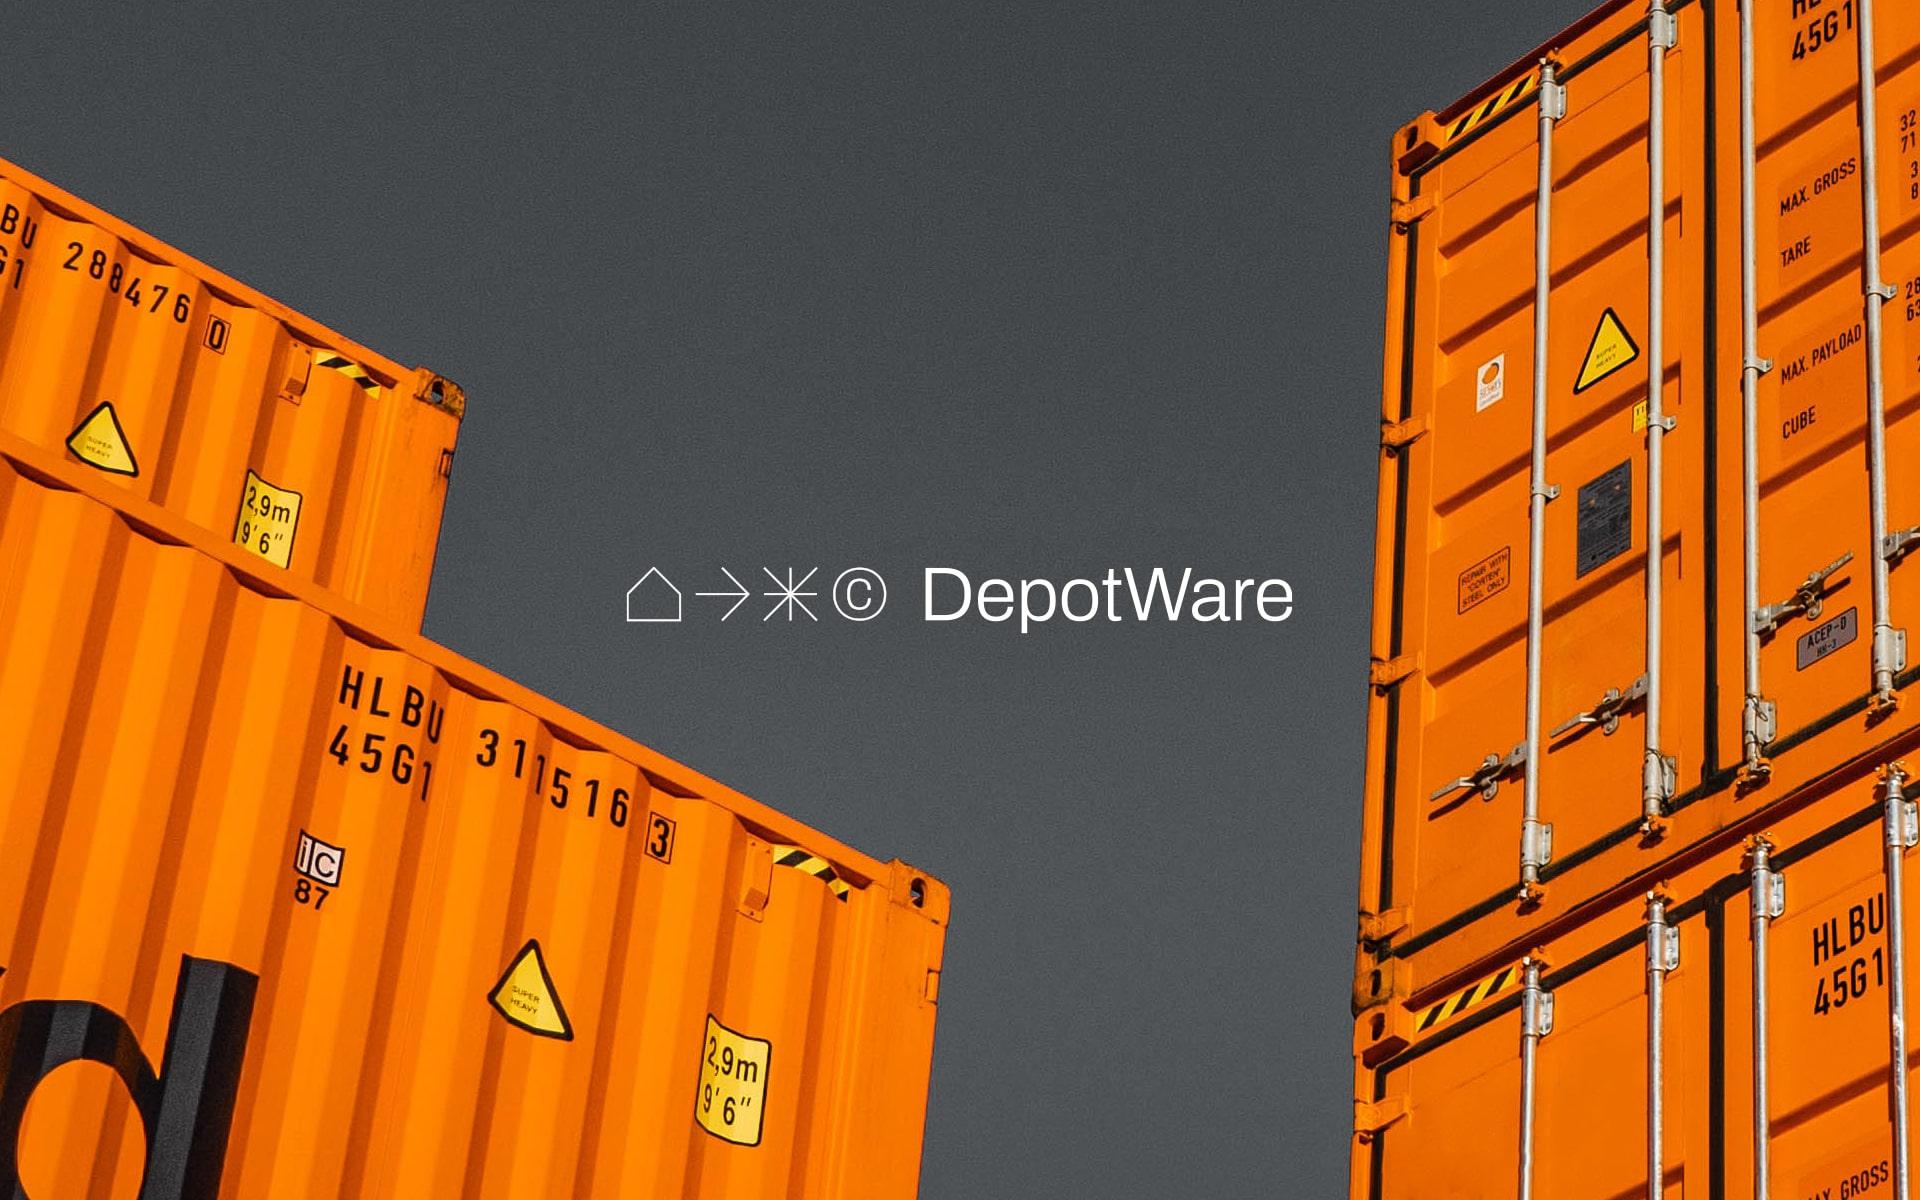 Raquel Fernandes Creates DepotWare Brand Design